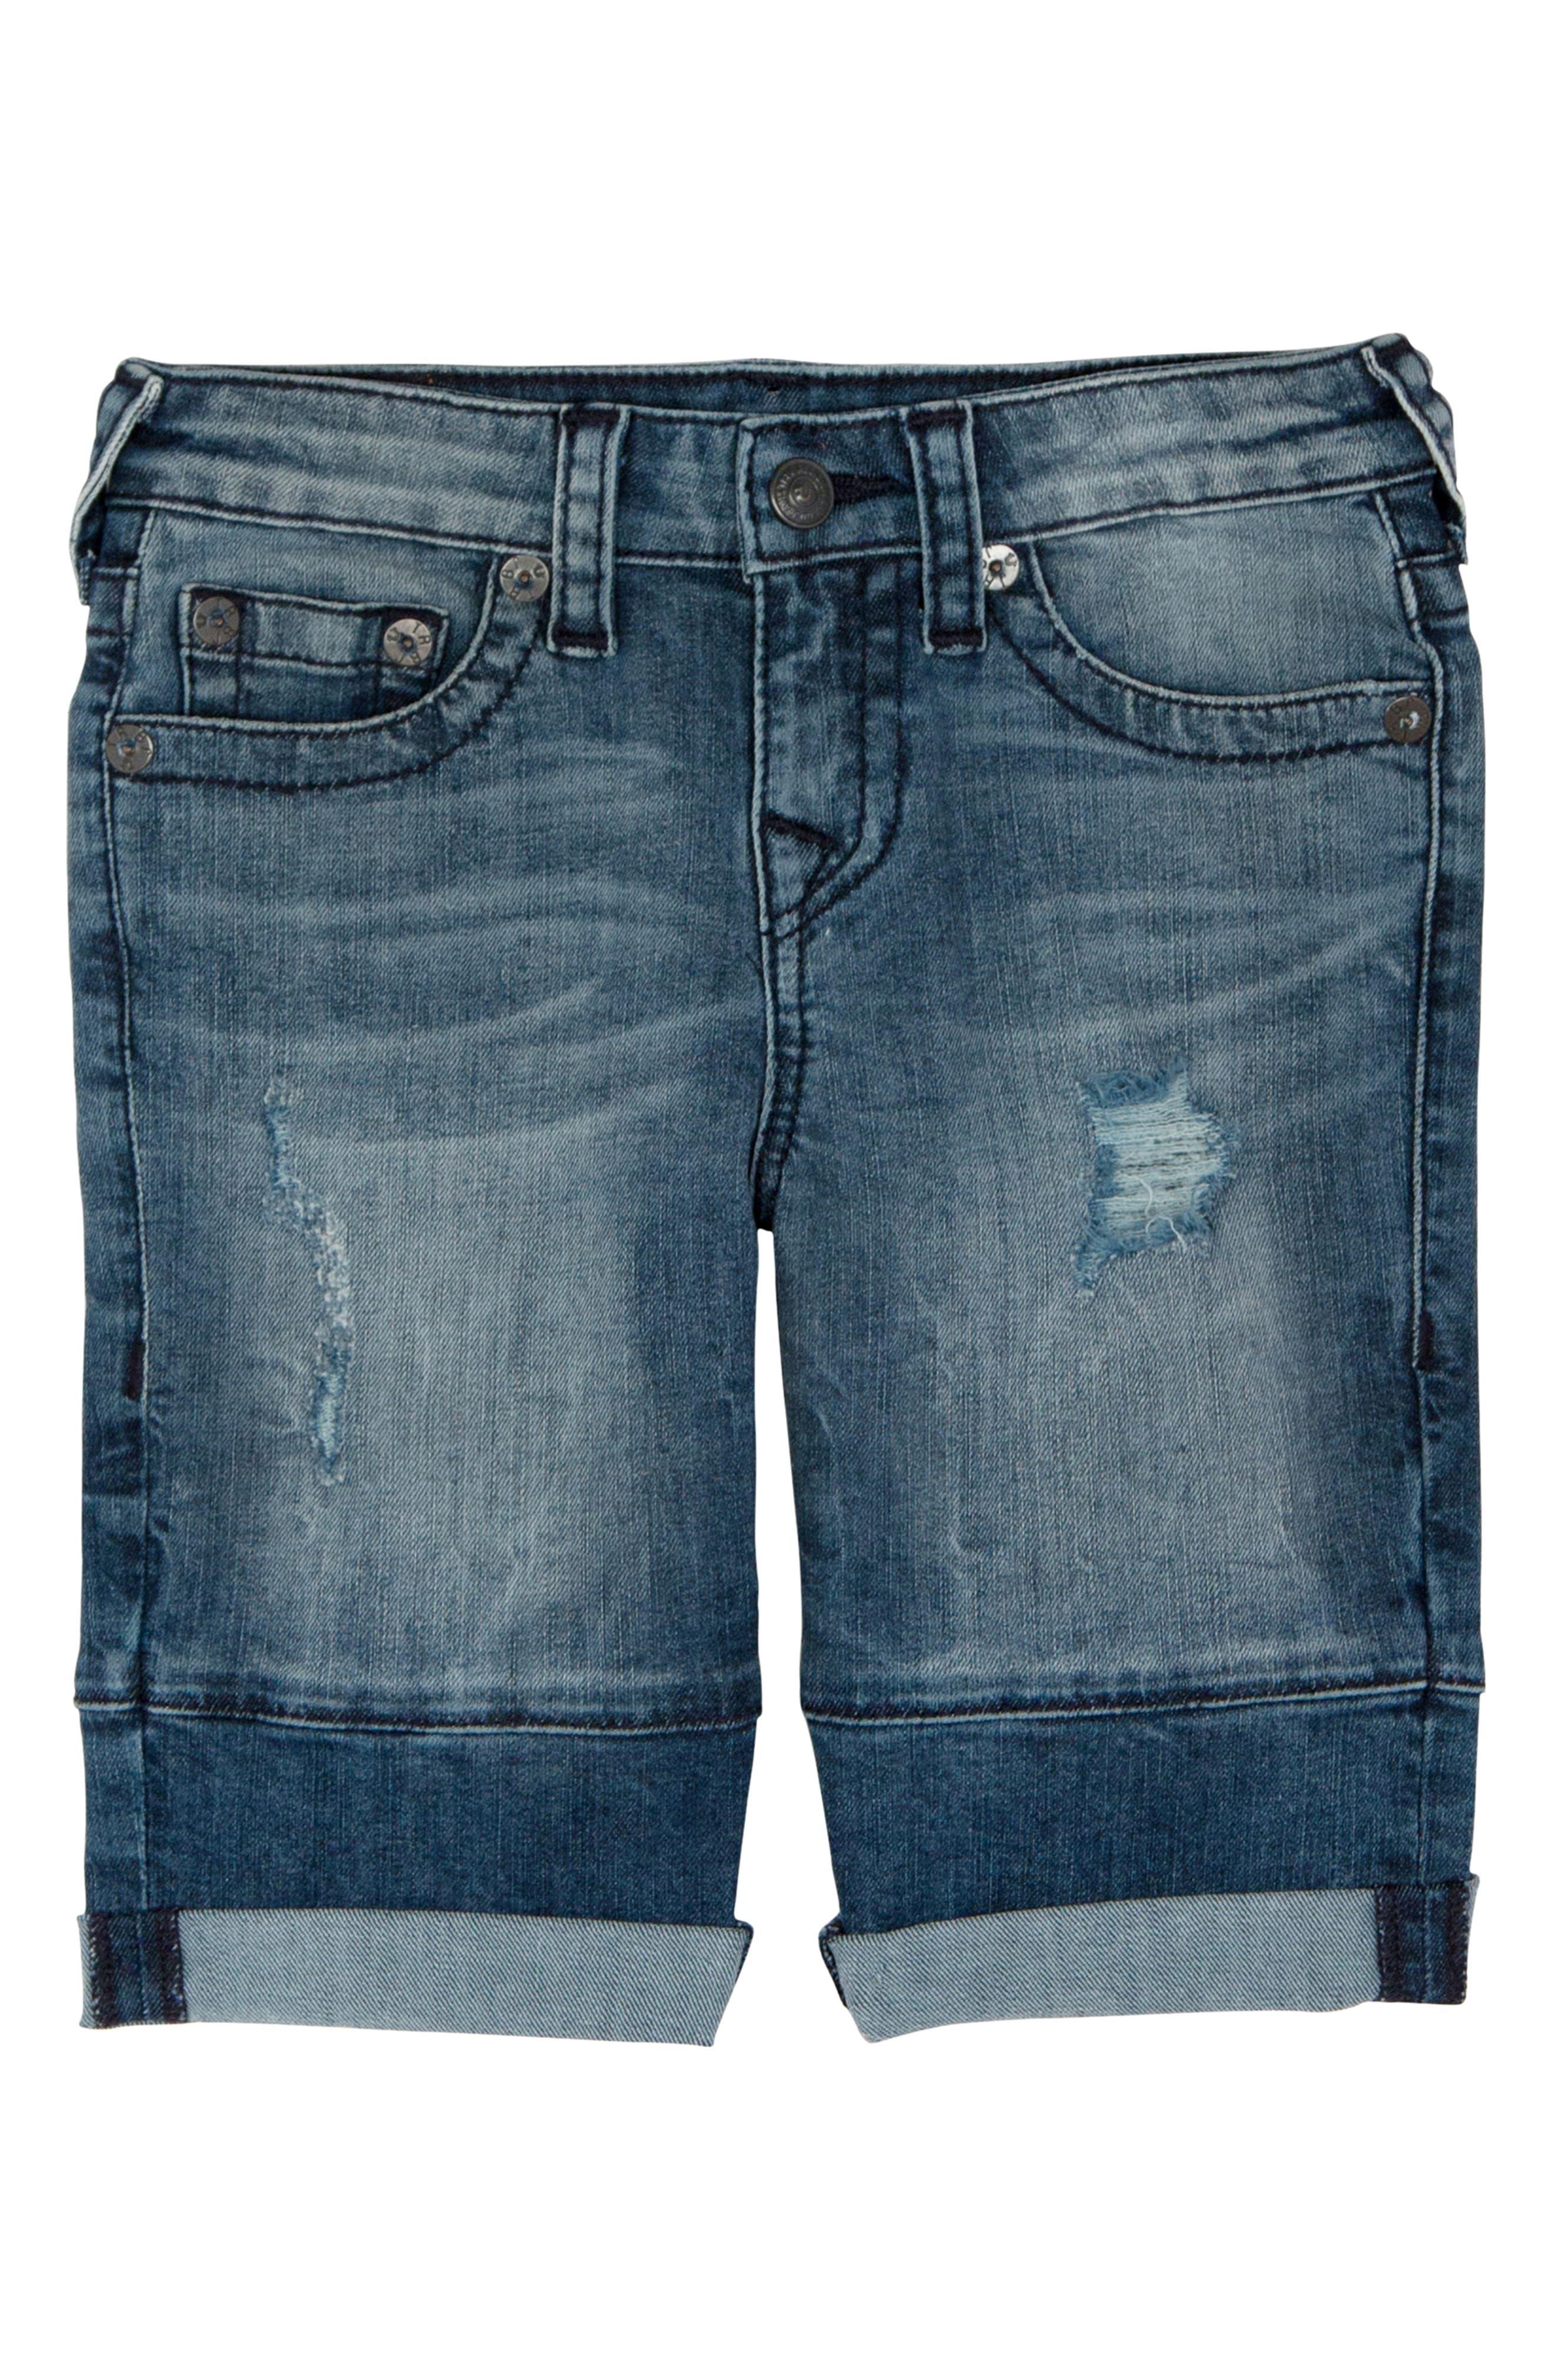 Geno Shorts,                         Main,                         color, BLEACHED ROAD